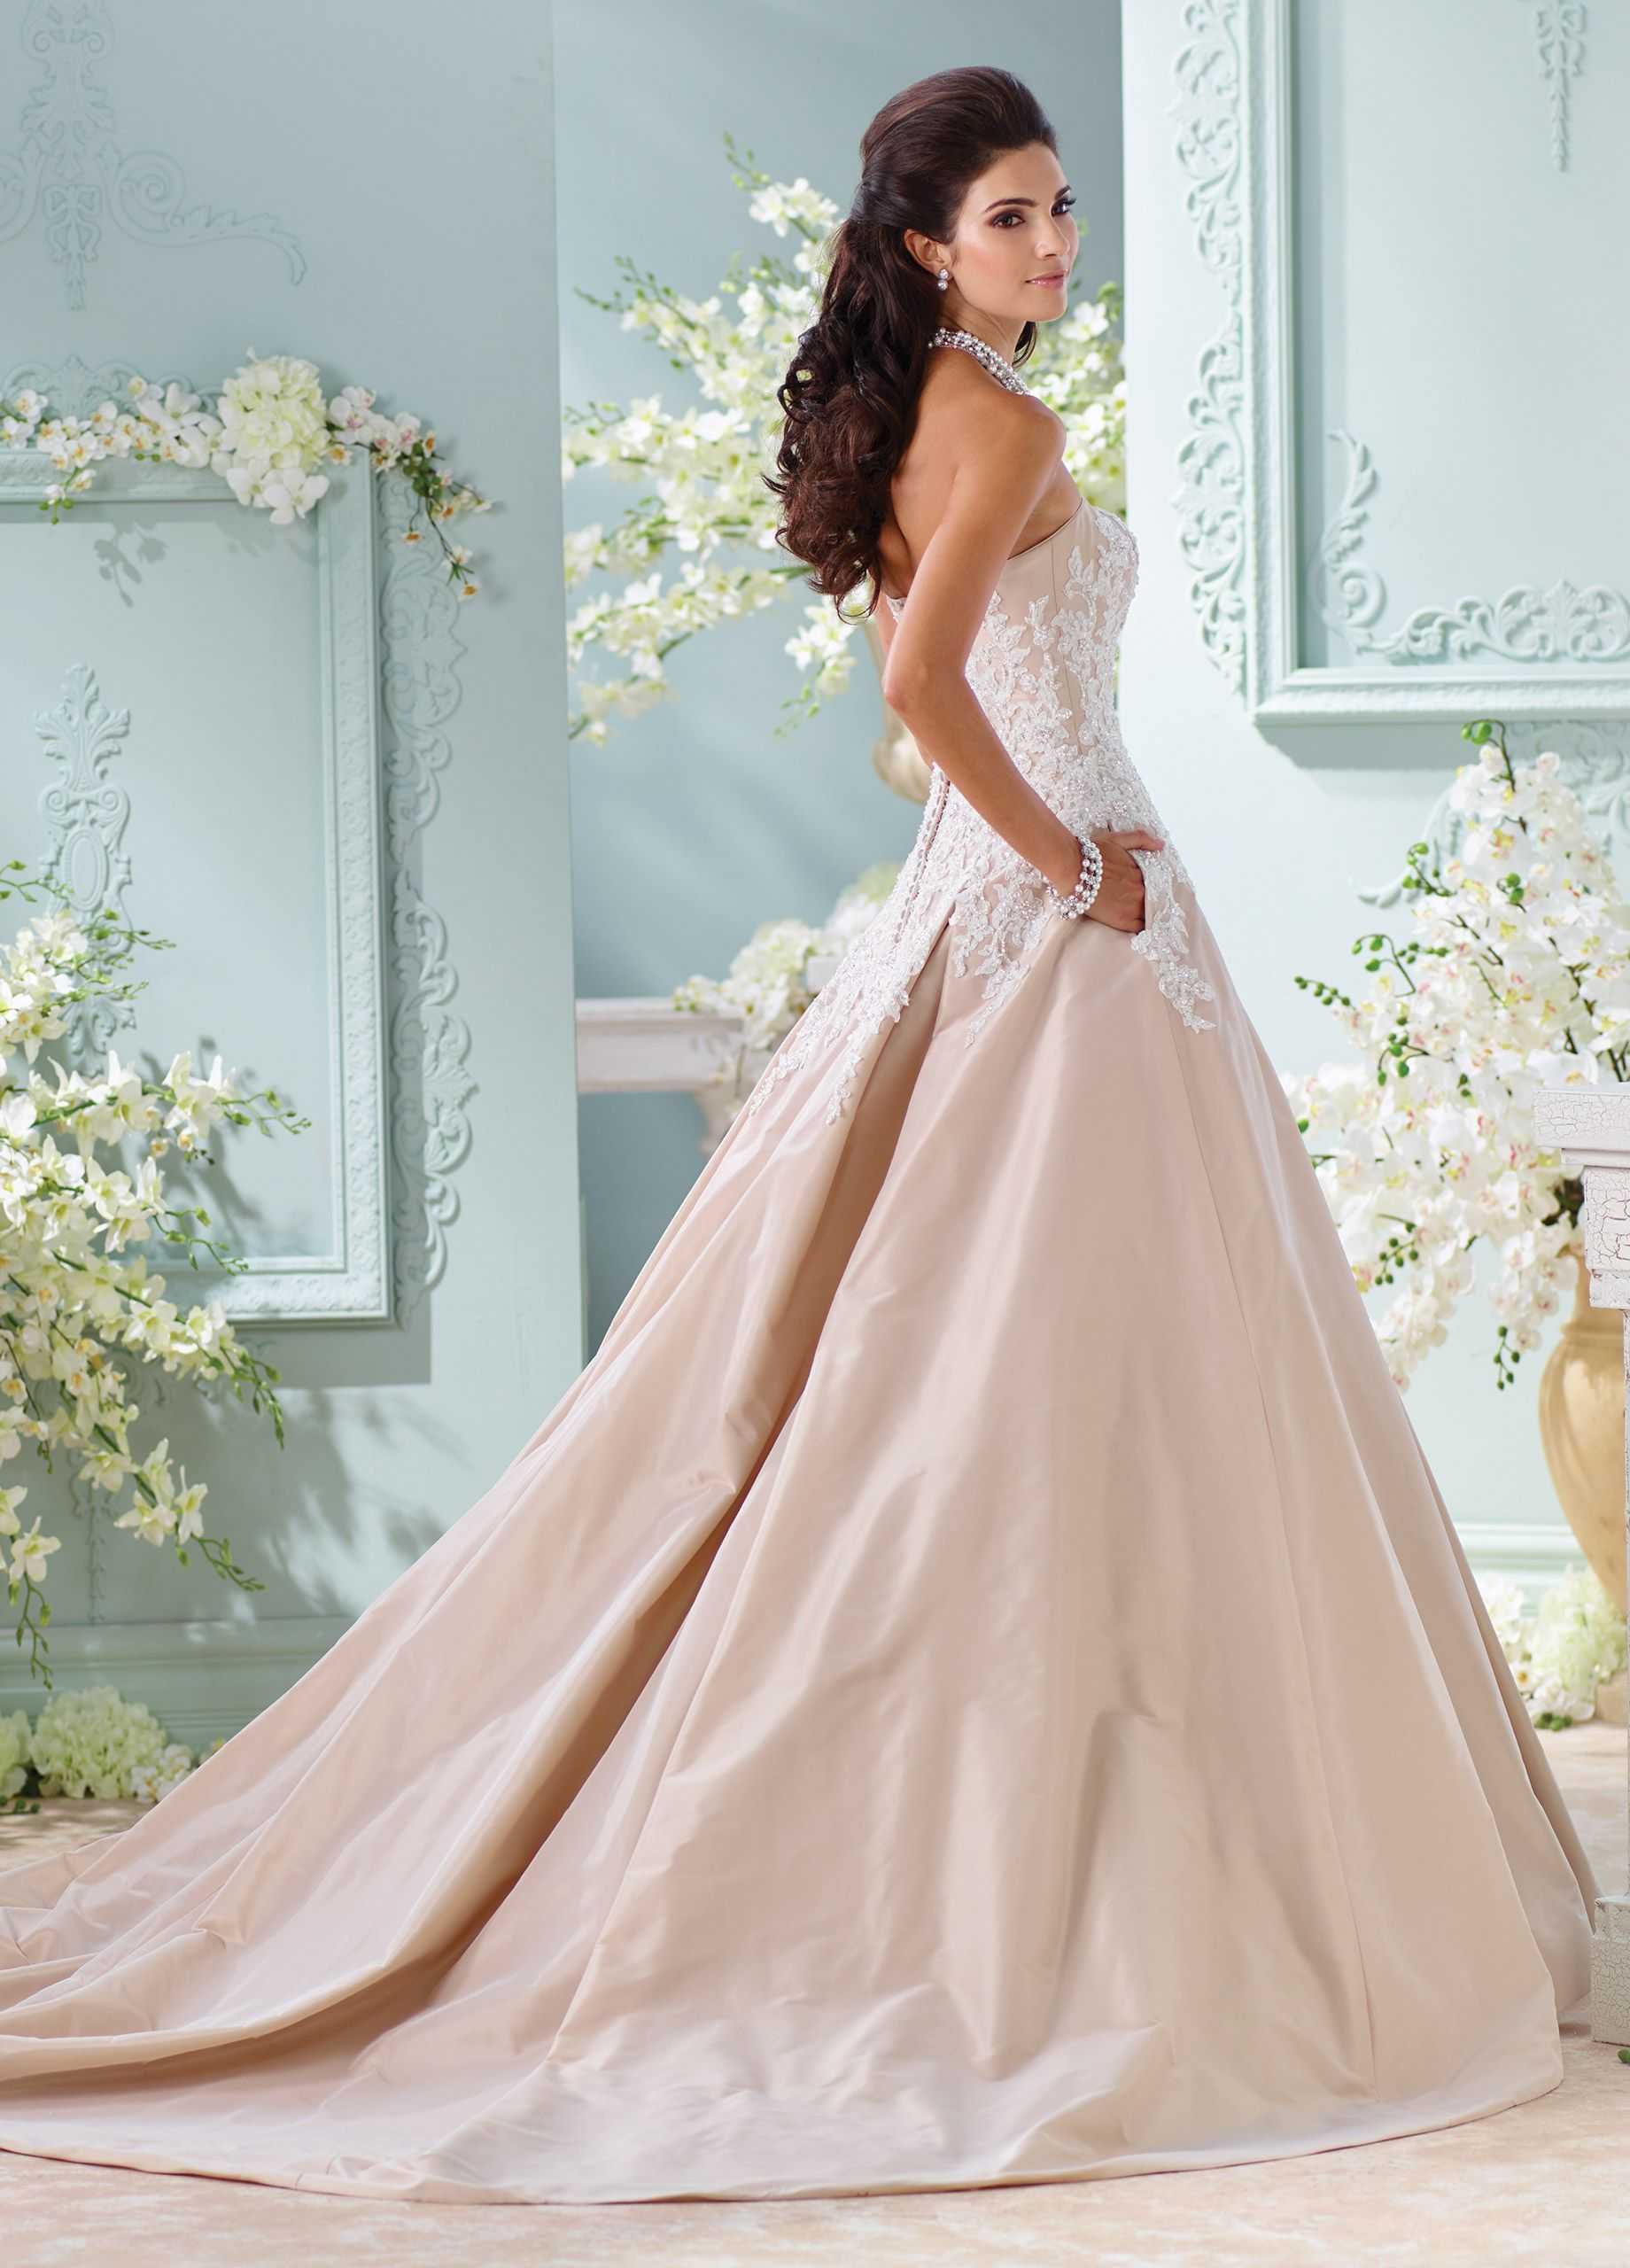 Champagne Taffeta & Lace Ball Gown Wedding Dress-116217 Alleen ...